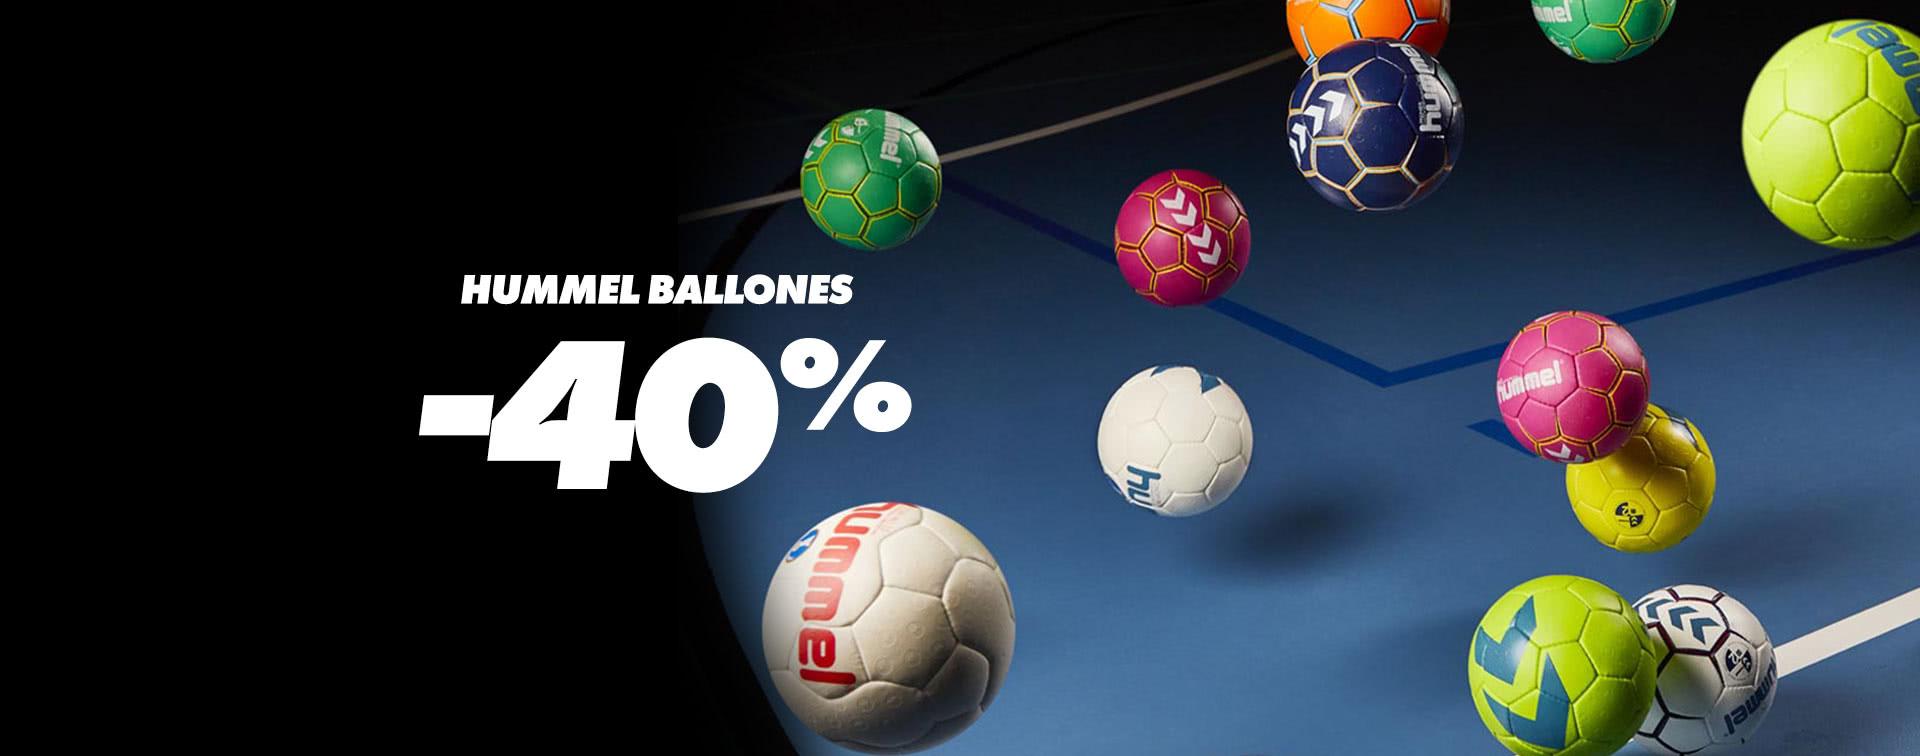 Hummel ballones -40%